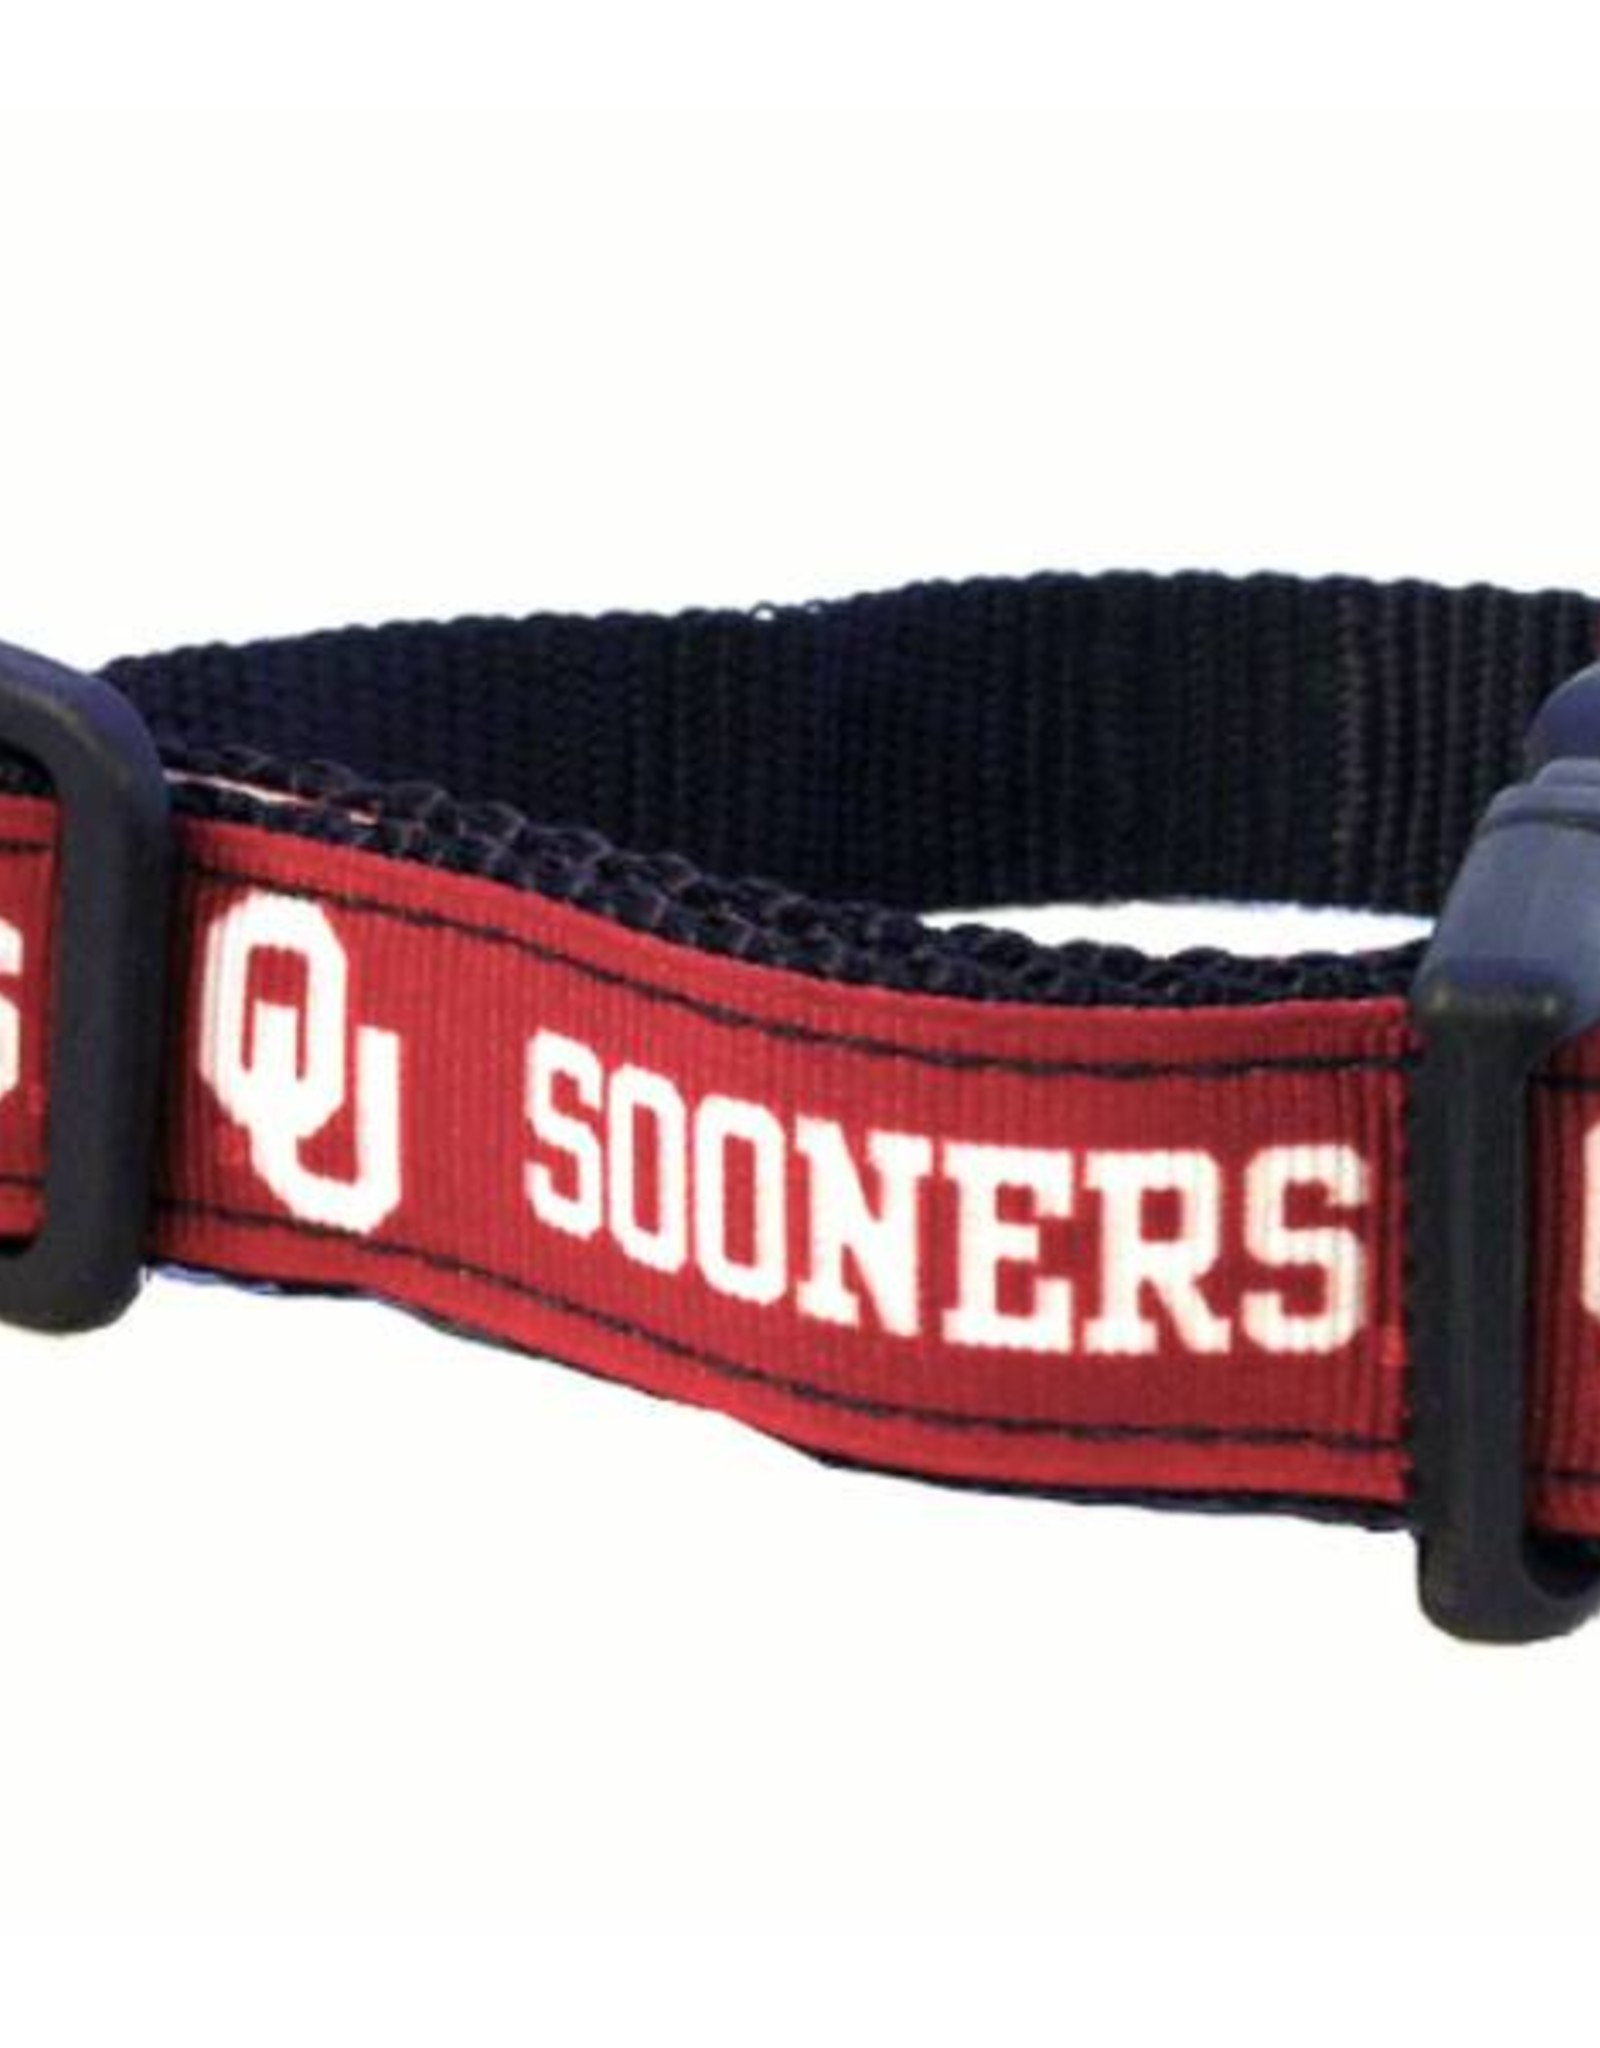 All Star Dogs OU Sooners Crimson Ribbon Dog Collar